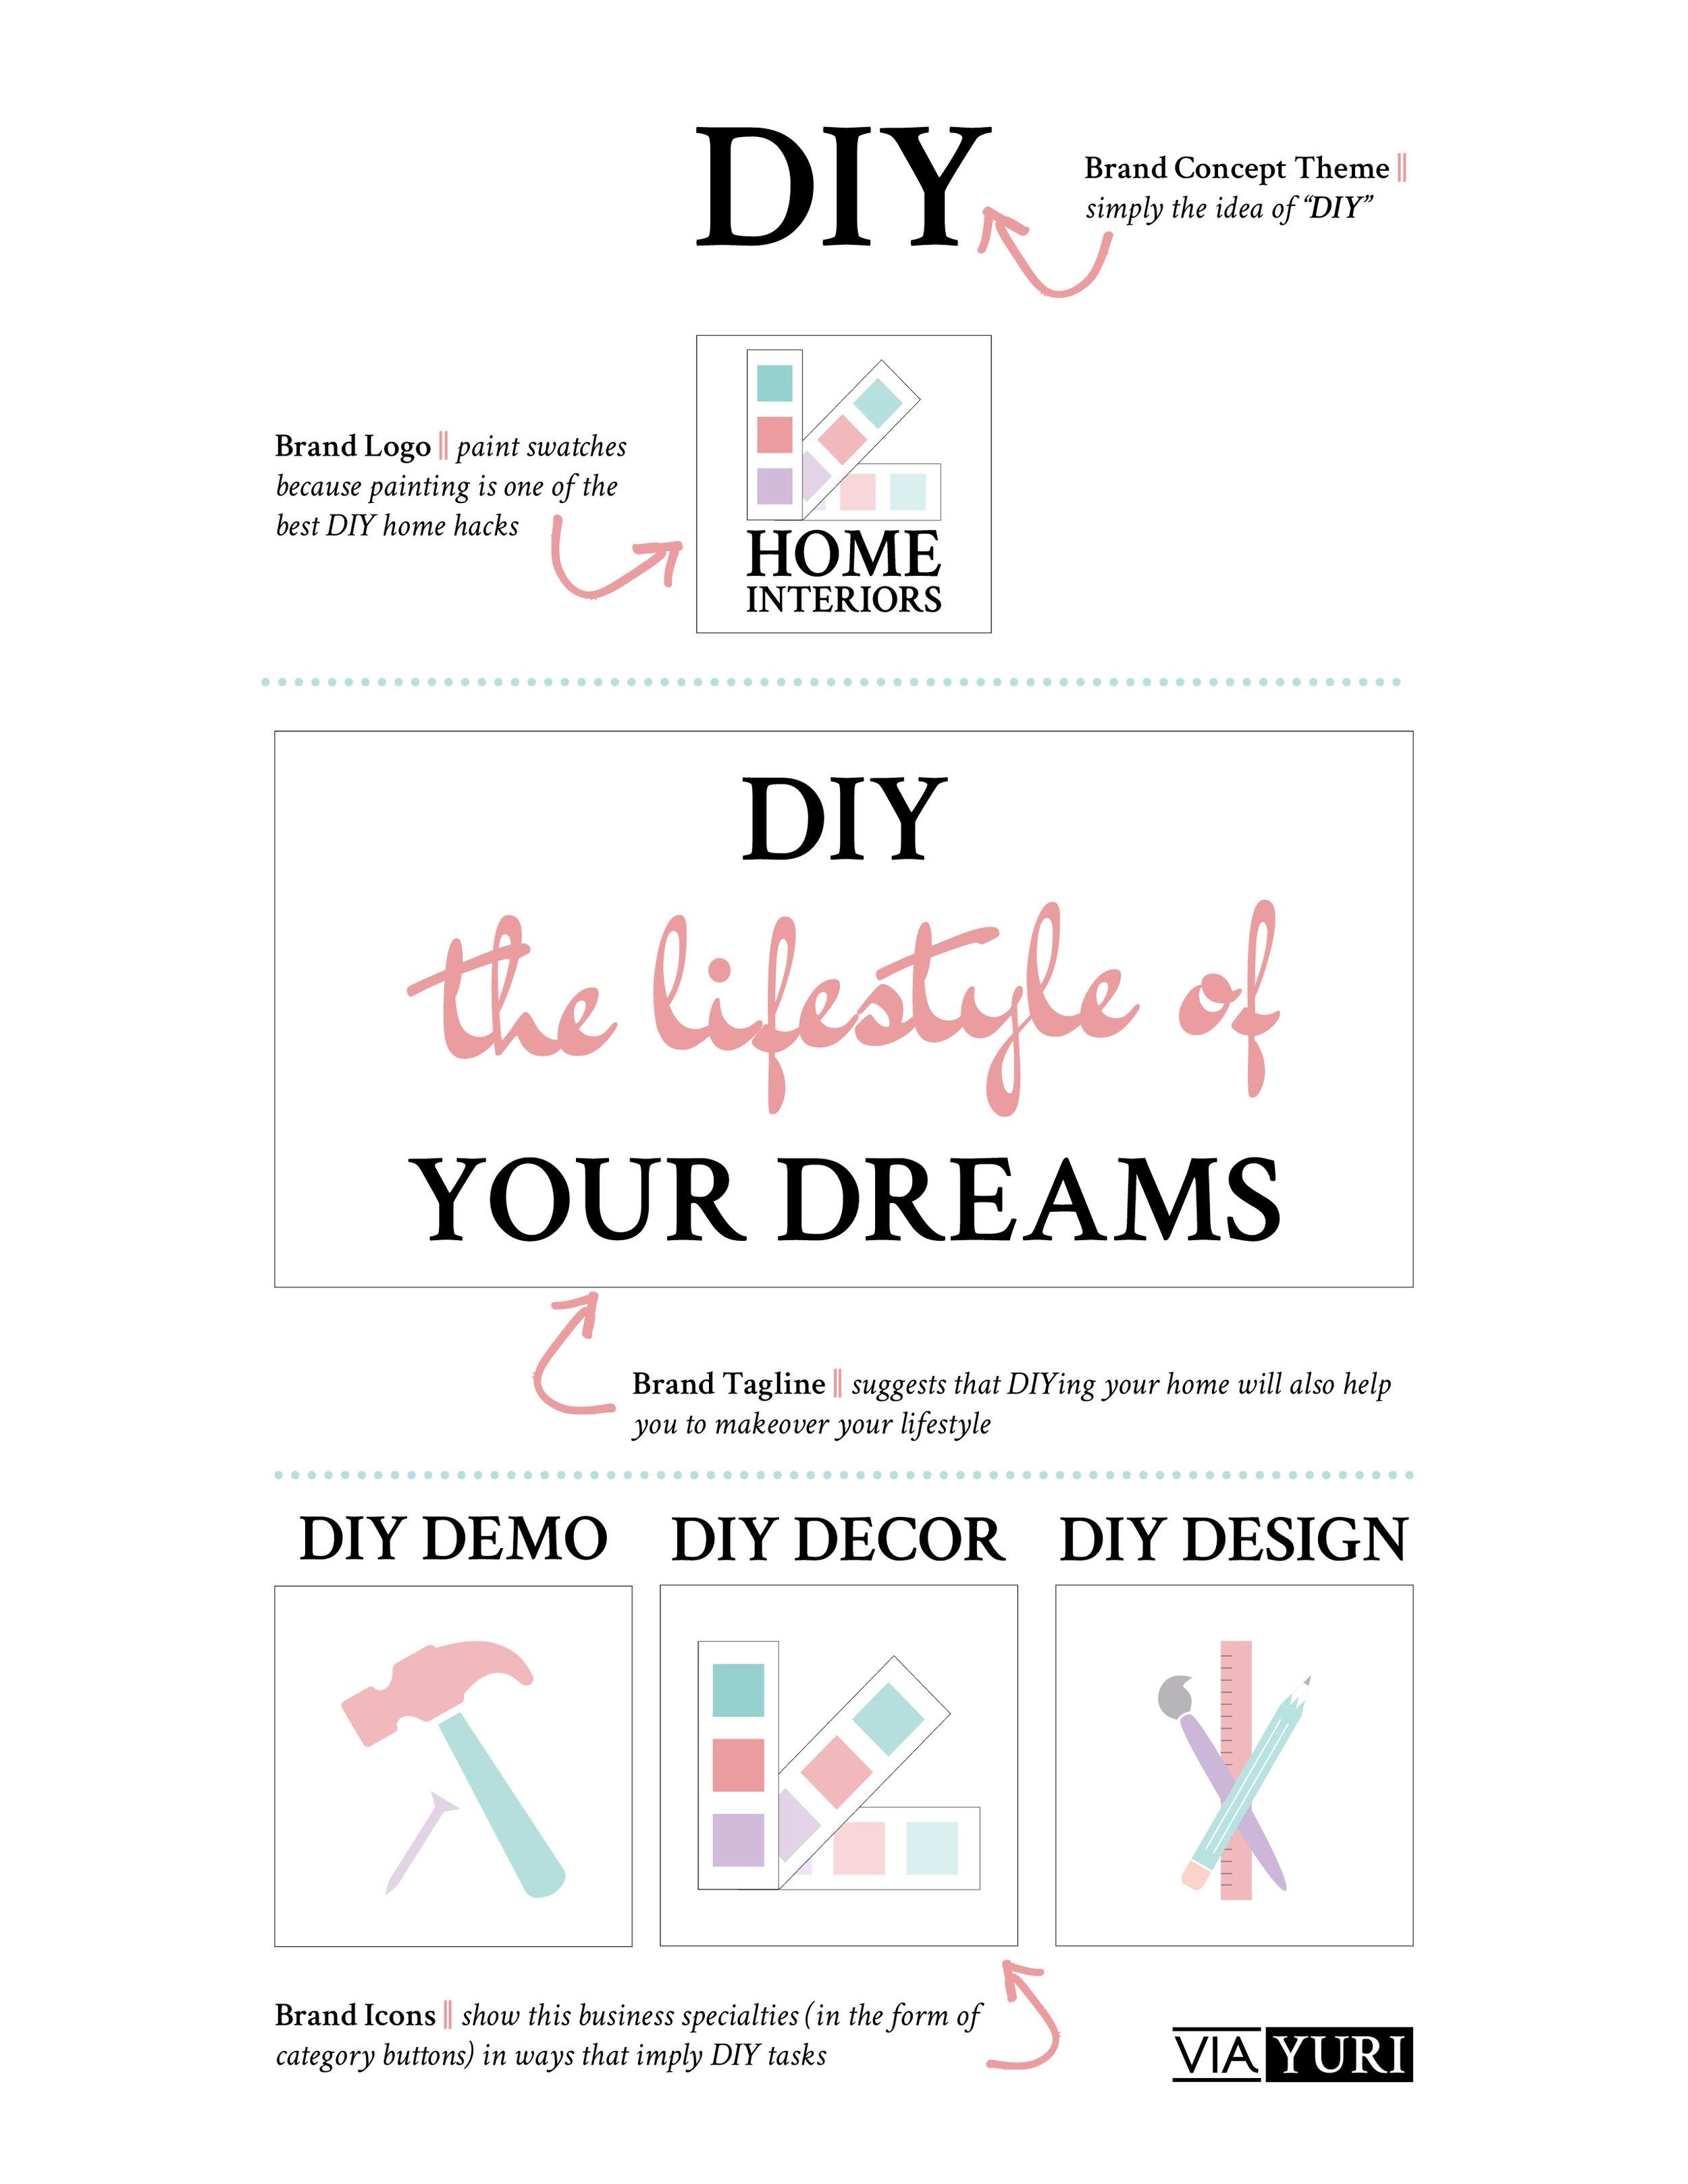 Concept Theme Cheatsheet || The Side Hustle Quickstart Roadmap Free Course Worksheets | viaYuri.com